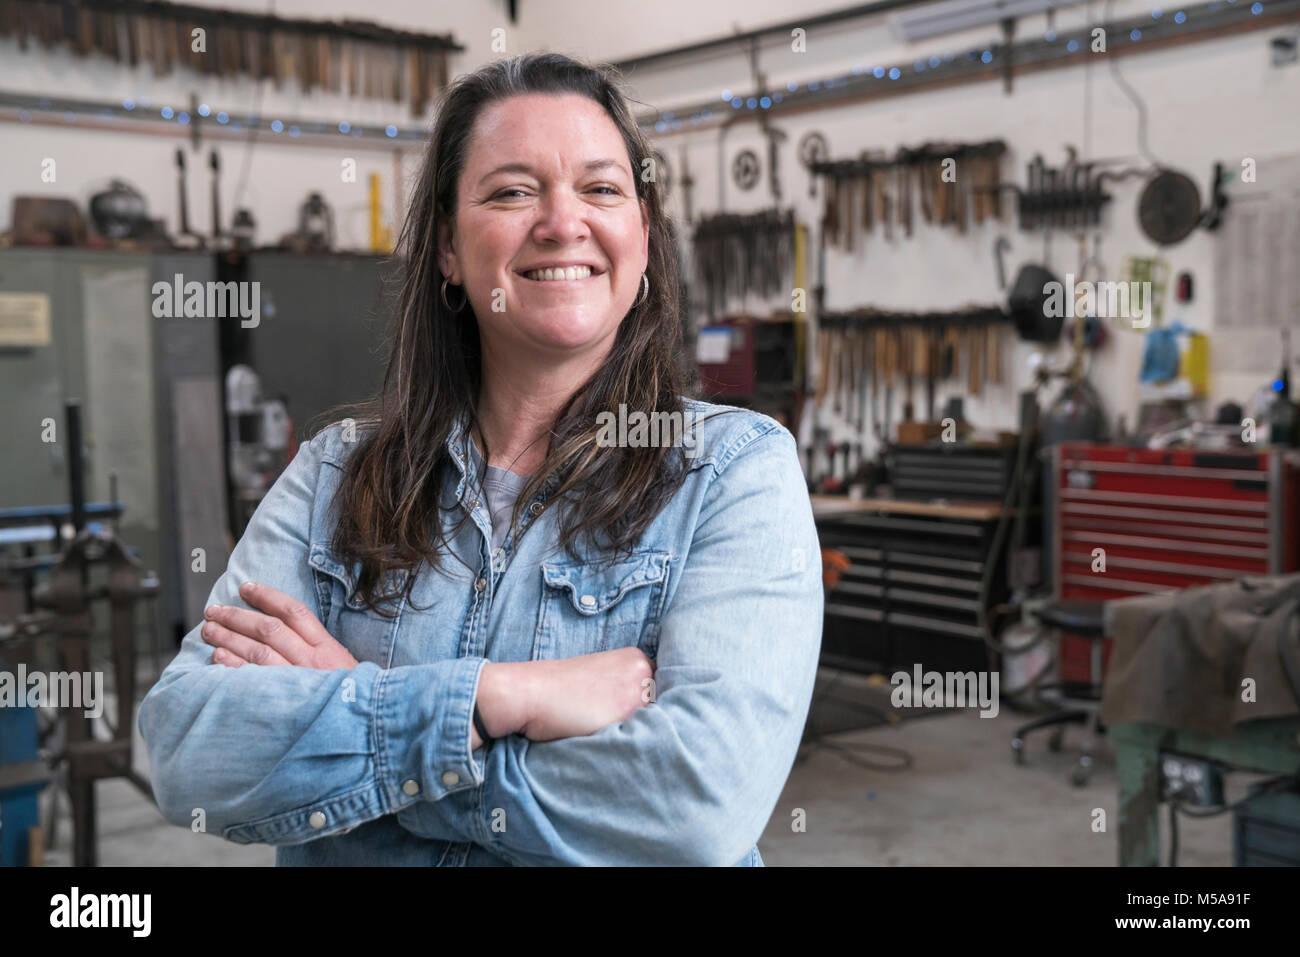 Woman with brown hair wearing Denim shirt standing in metal workshop, smiling at camera. - Stock Image